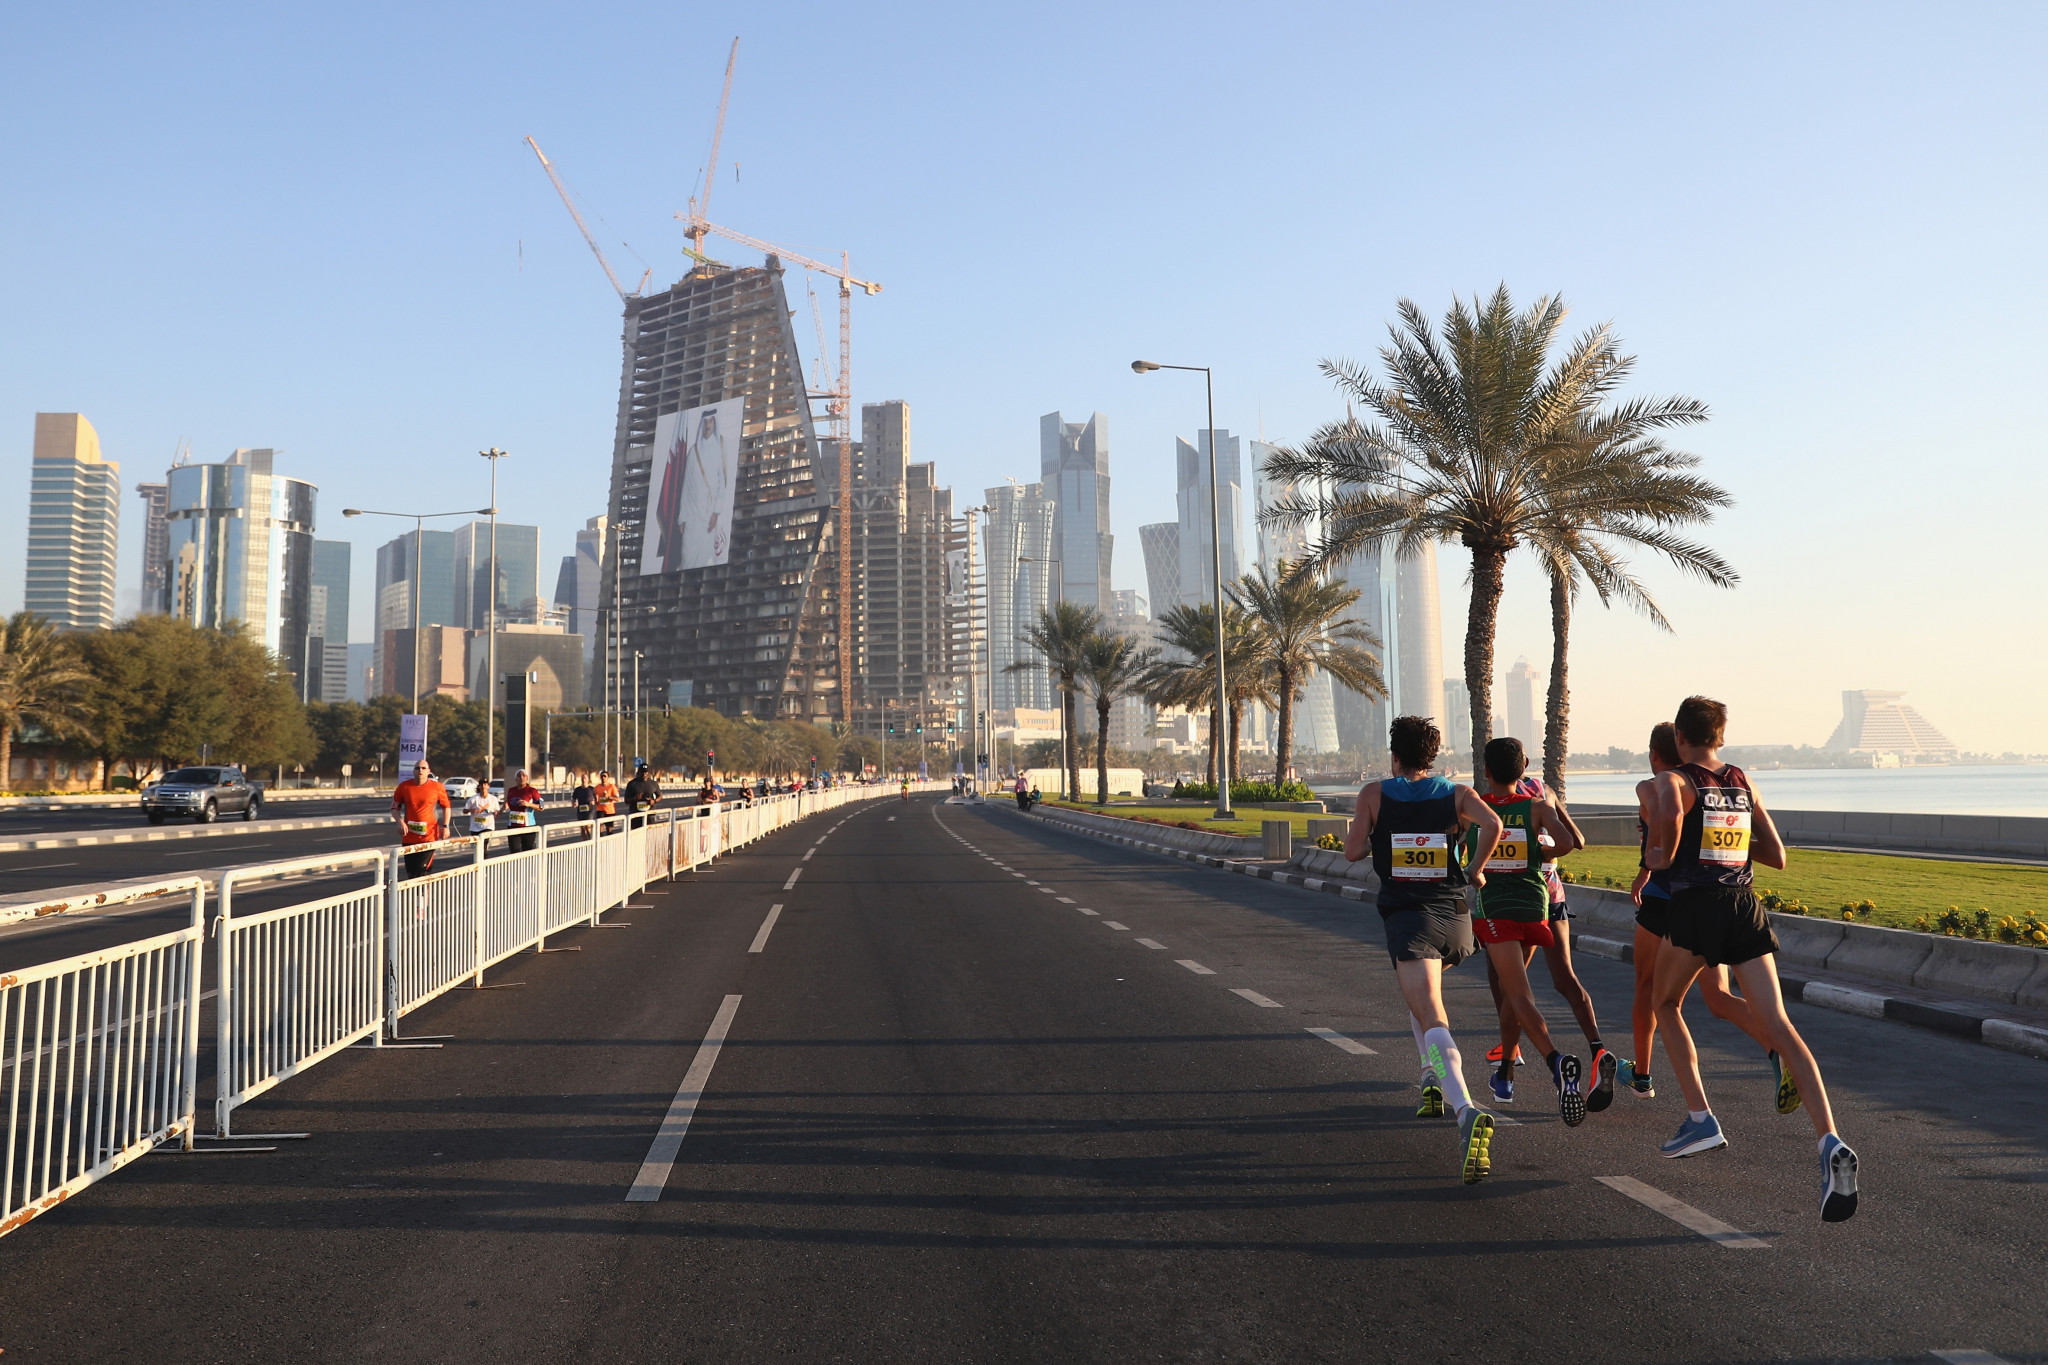 Doha's Corniche, where the IAAF World Championship marathons will soon be held. Hot ©Getty Images